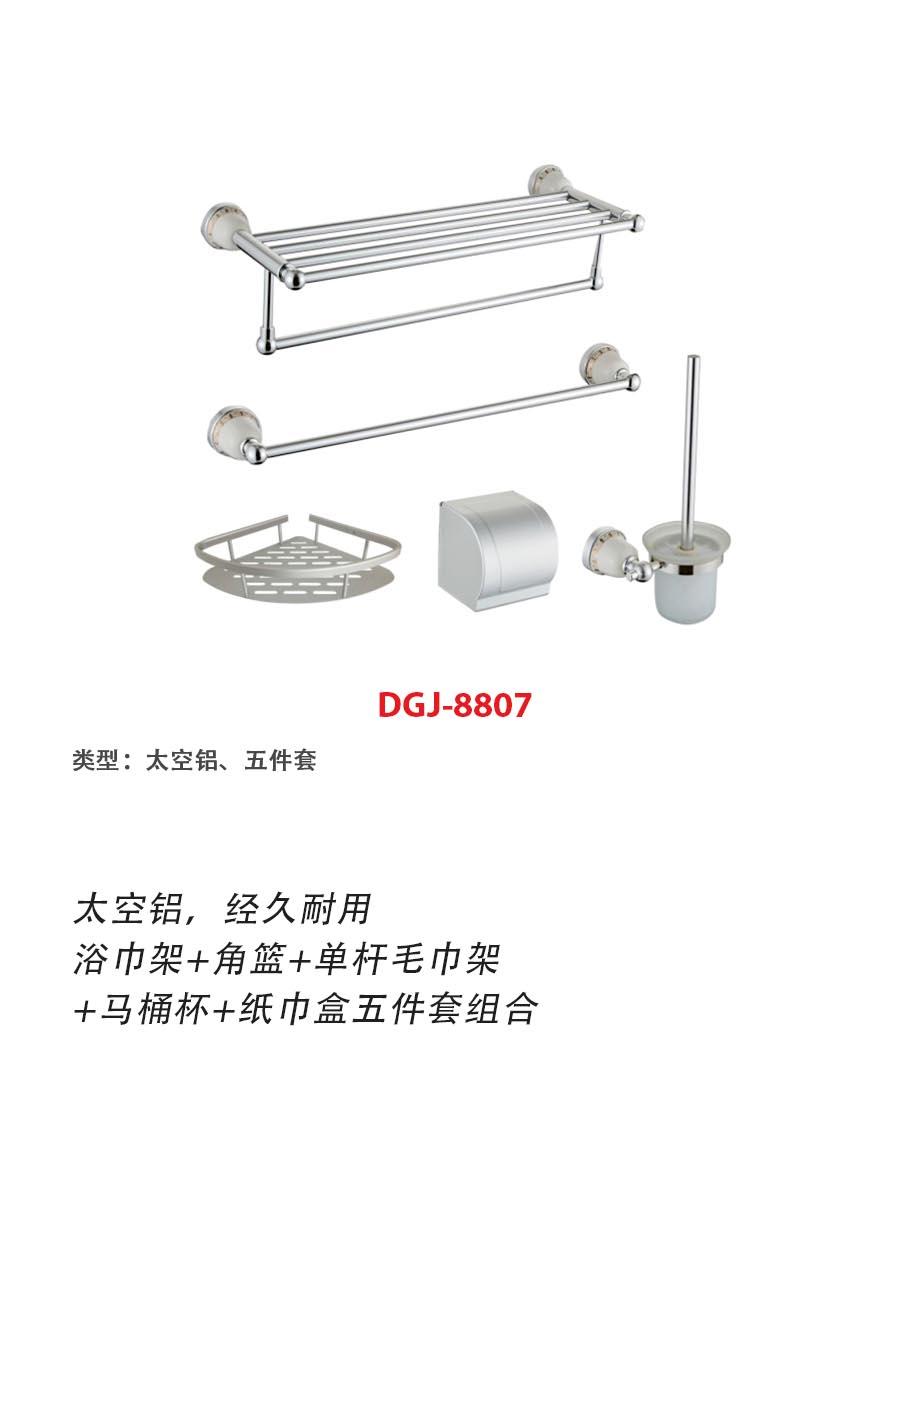 DGJ-8807b.jpg